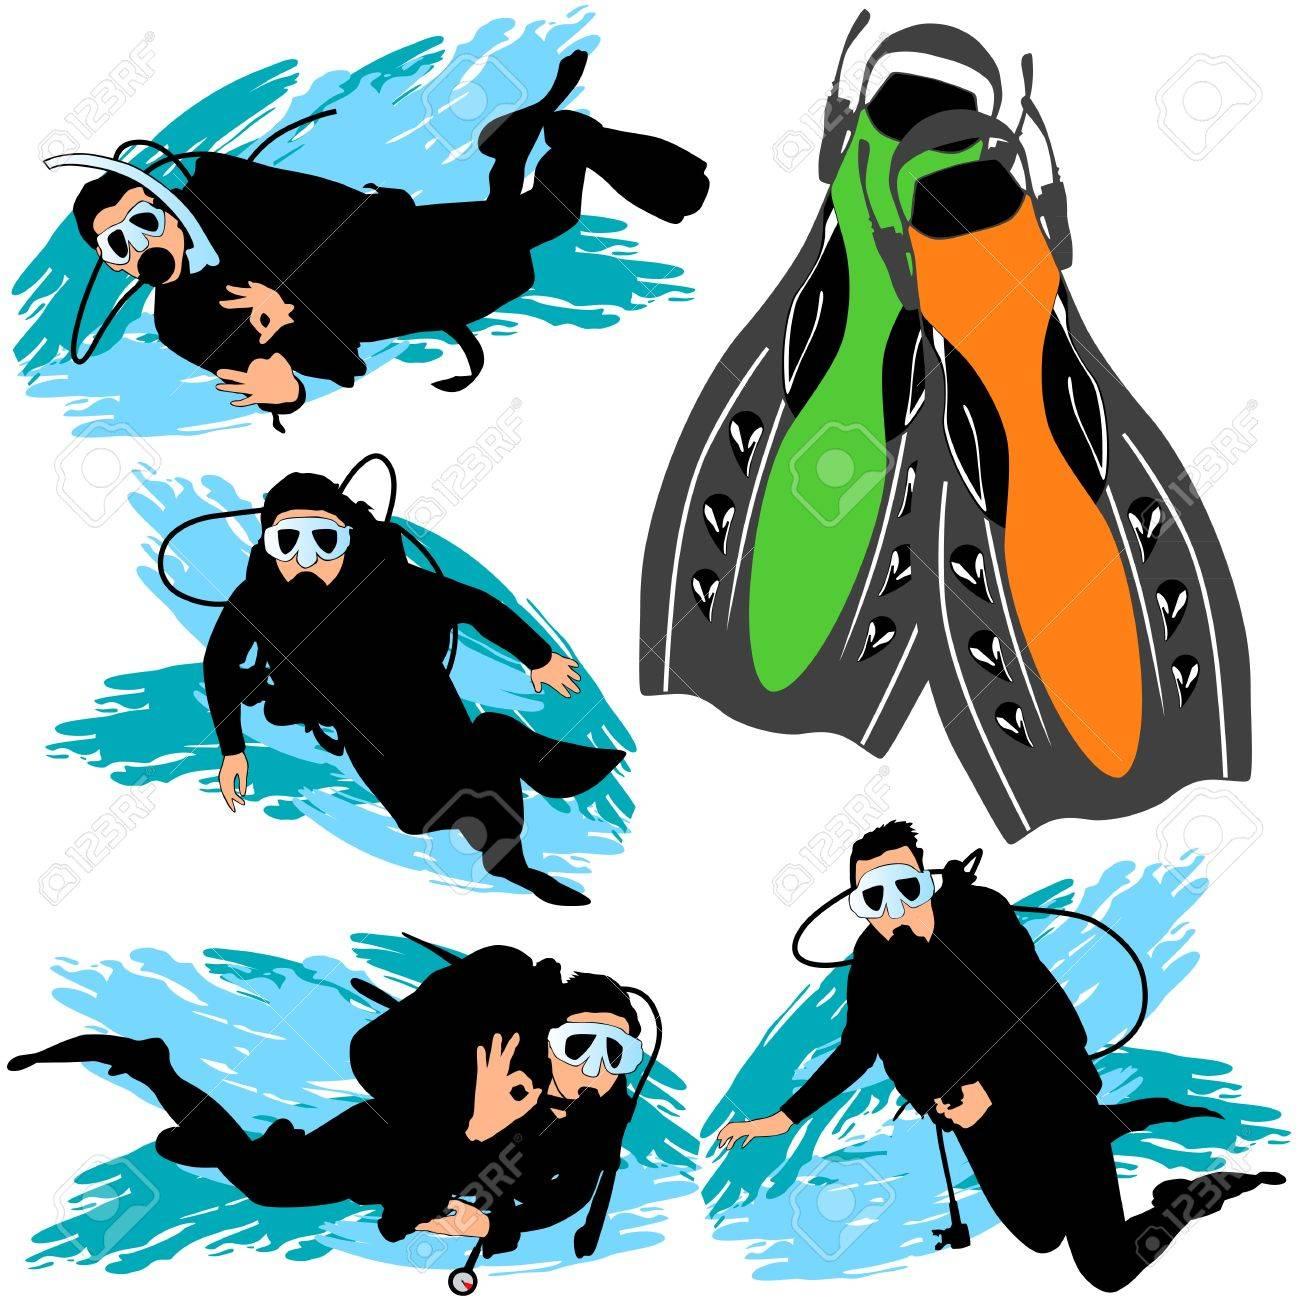 Scuba diving silhouettes set Stock Vector - 9903929